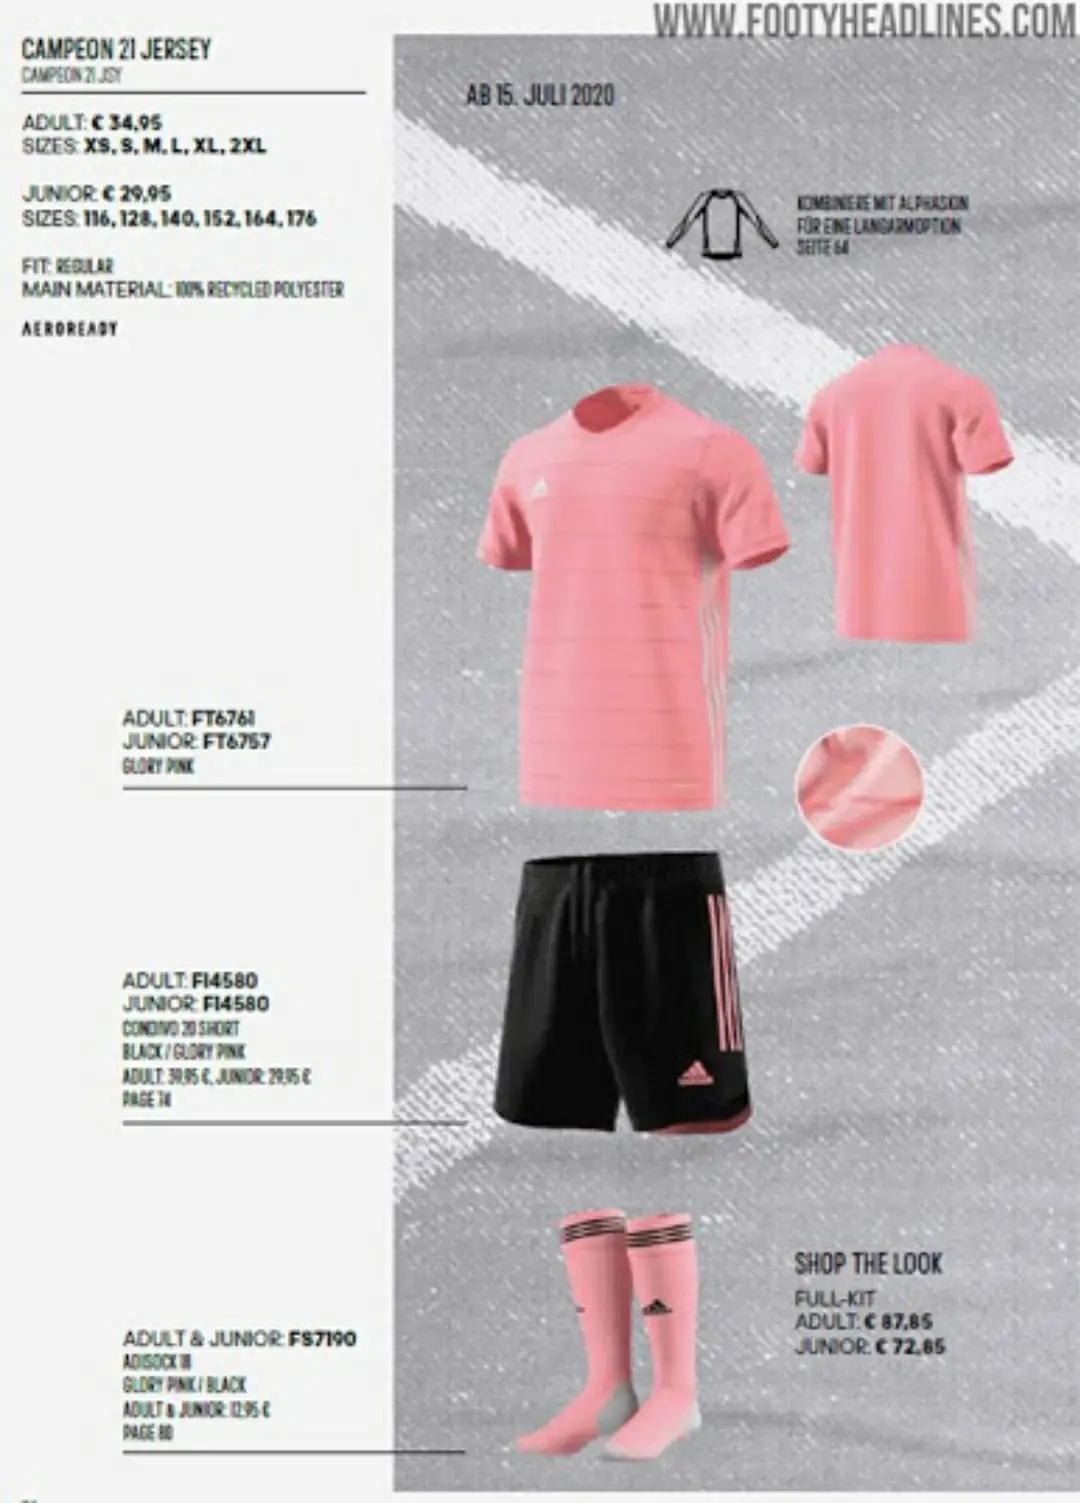 Template desain Adidas Campeon 21